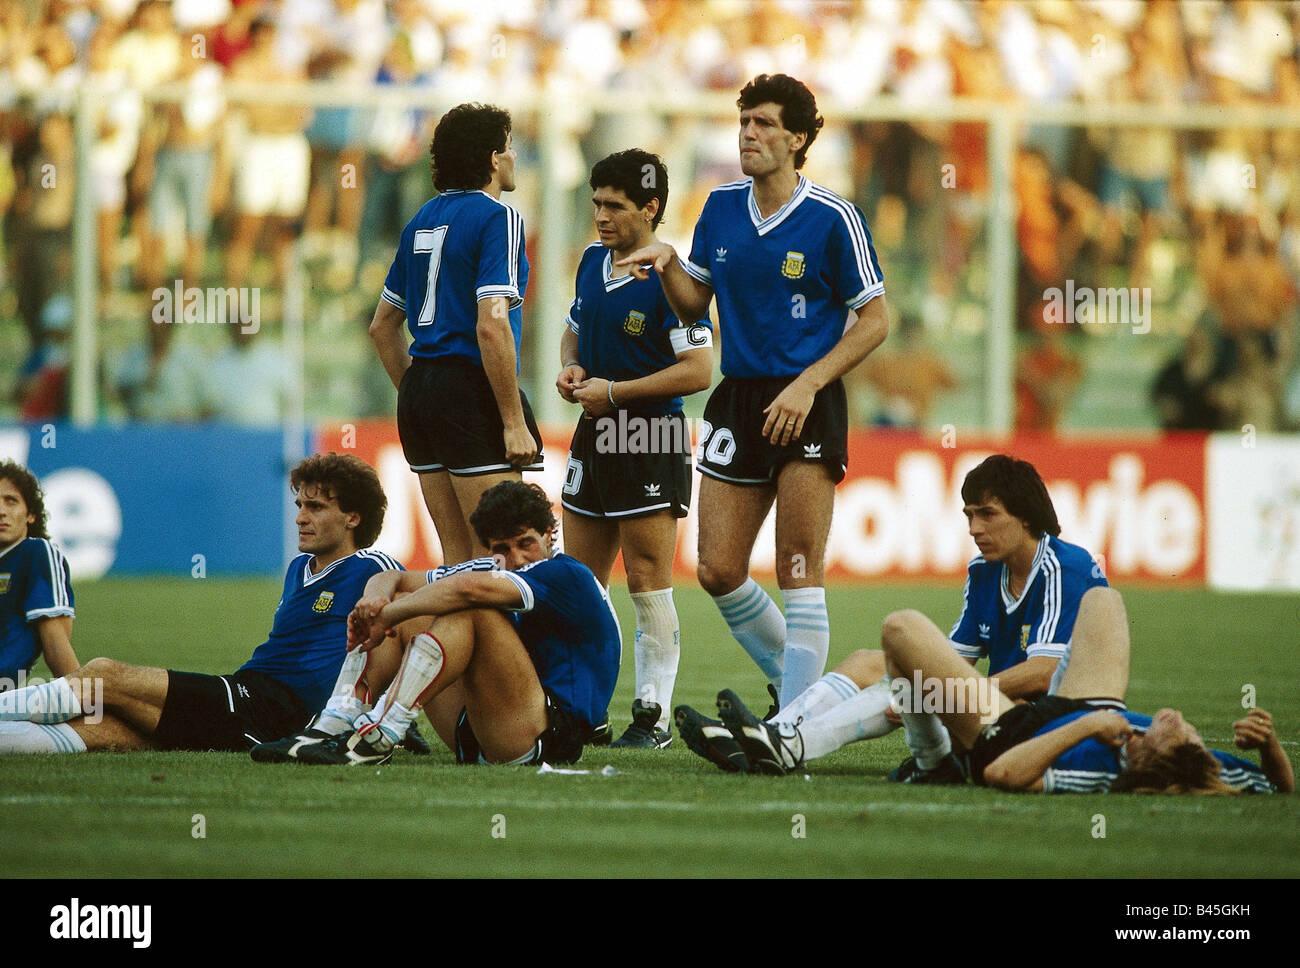 Sport Sport Fussball Fussball Wm 1990 Endrunde